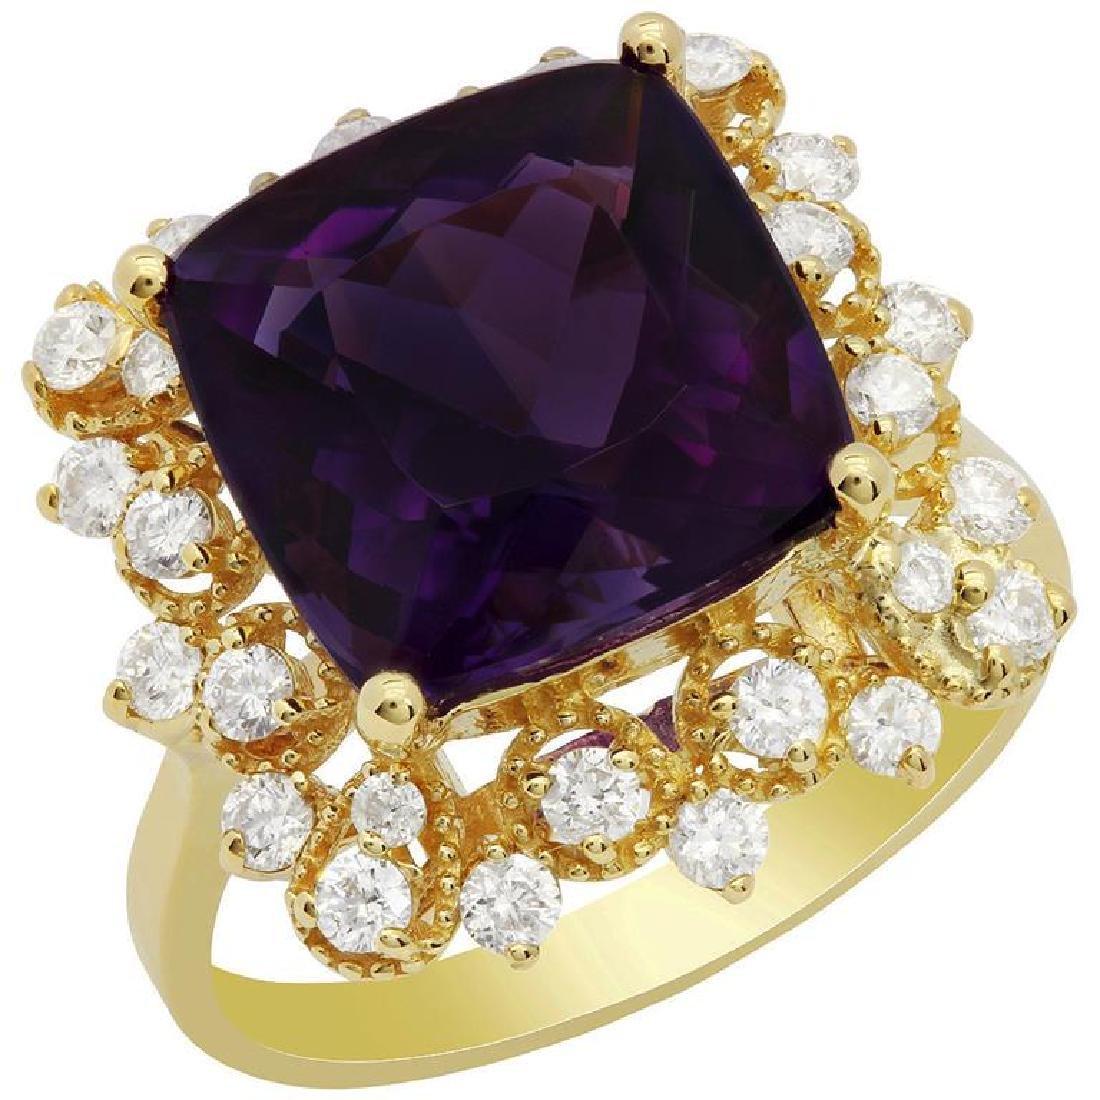 14k Yellow Gold 5.26ct Amethyst 0.71ct Diamond Ring